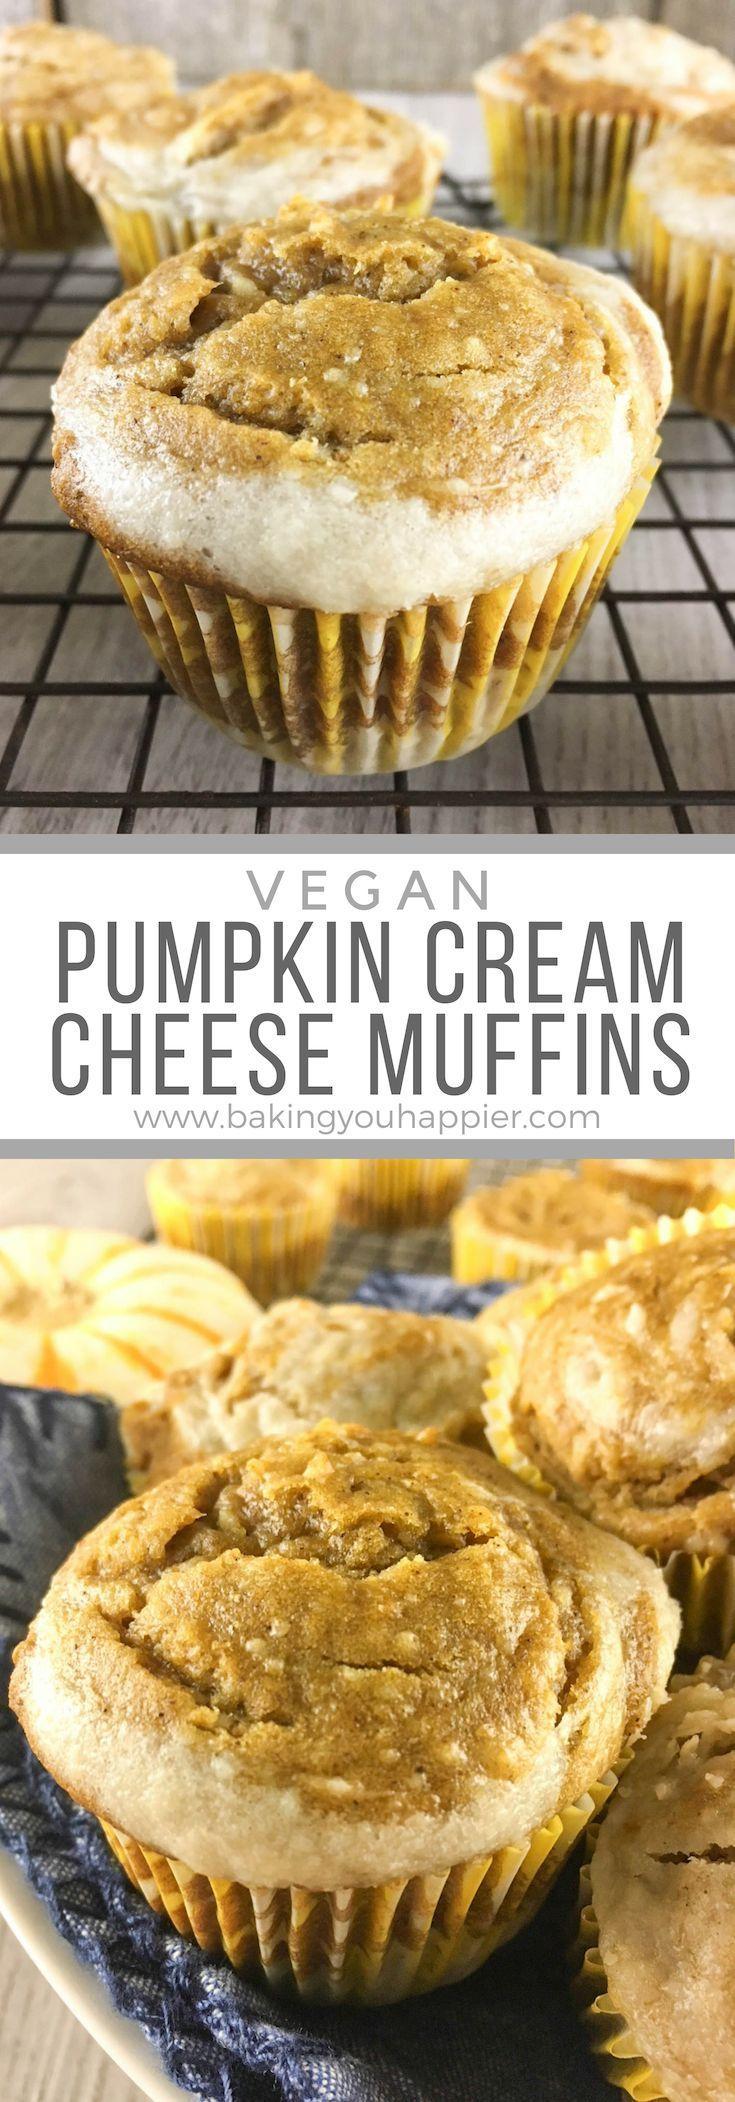 Vegan Pumpkin Cream Cheese Muffins | Baking You Happier